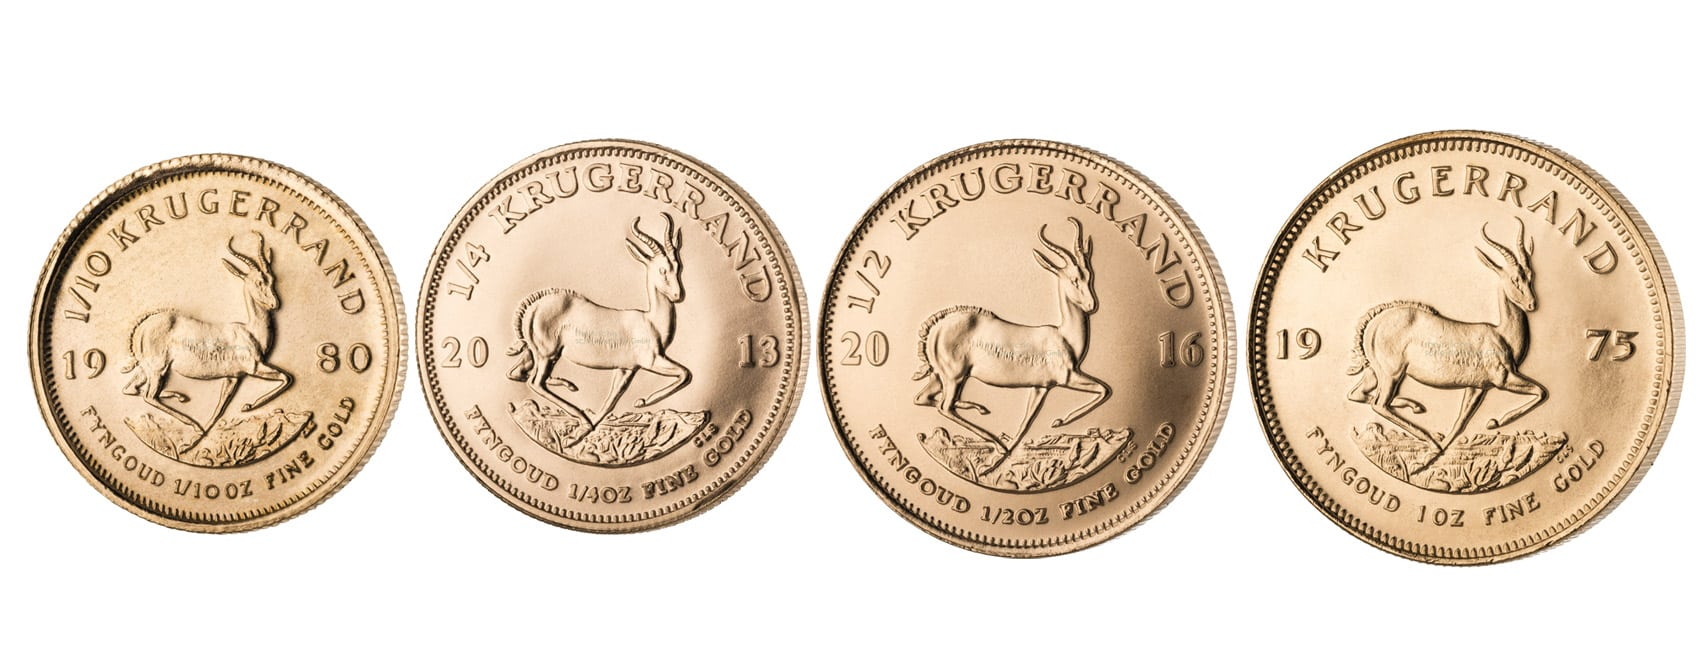 Kruegerrand Goldmünzen kaufen